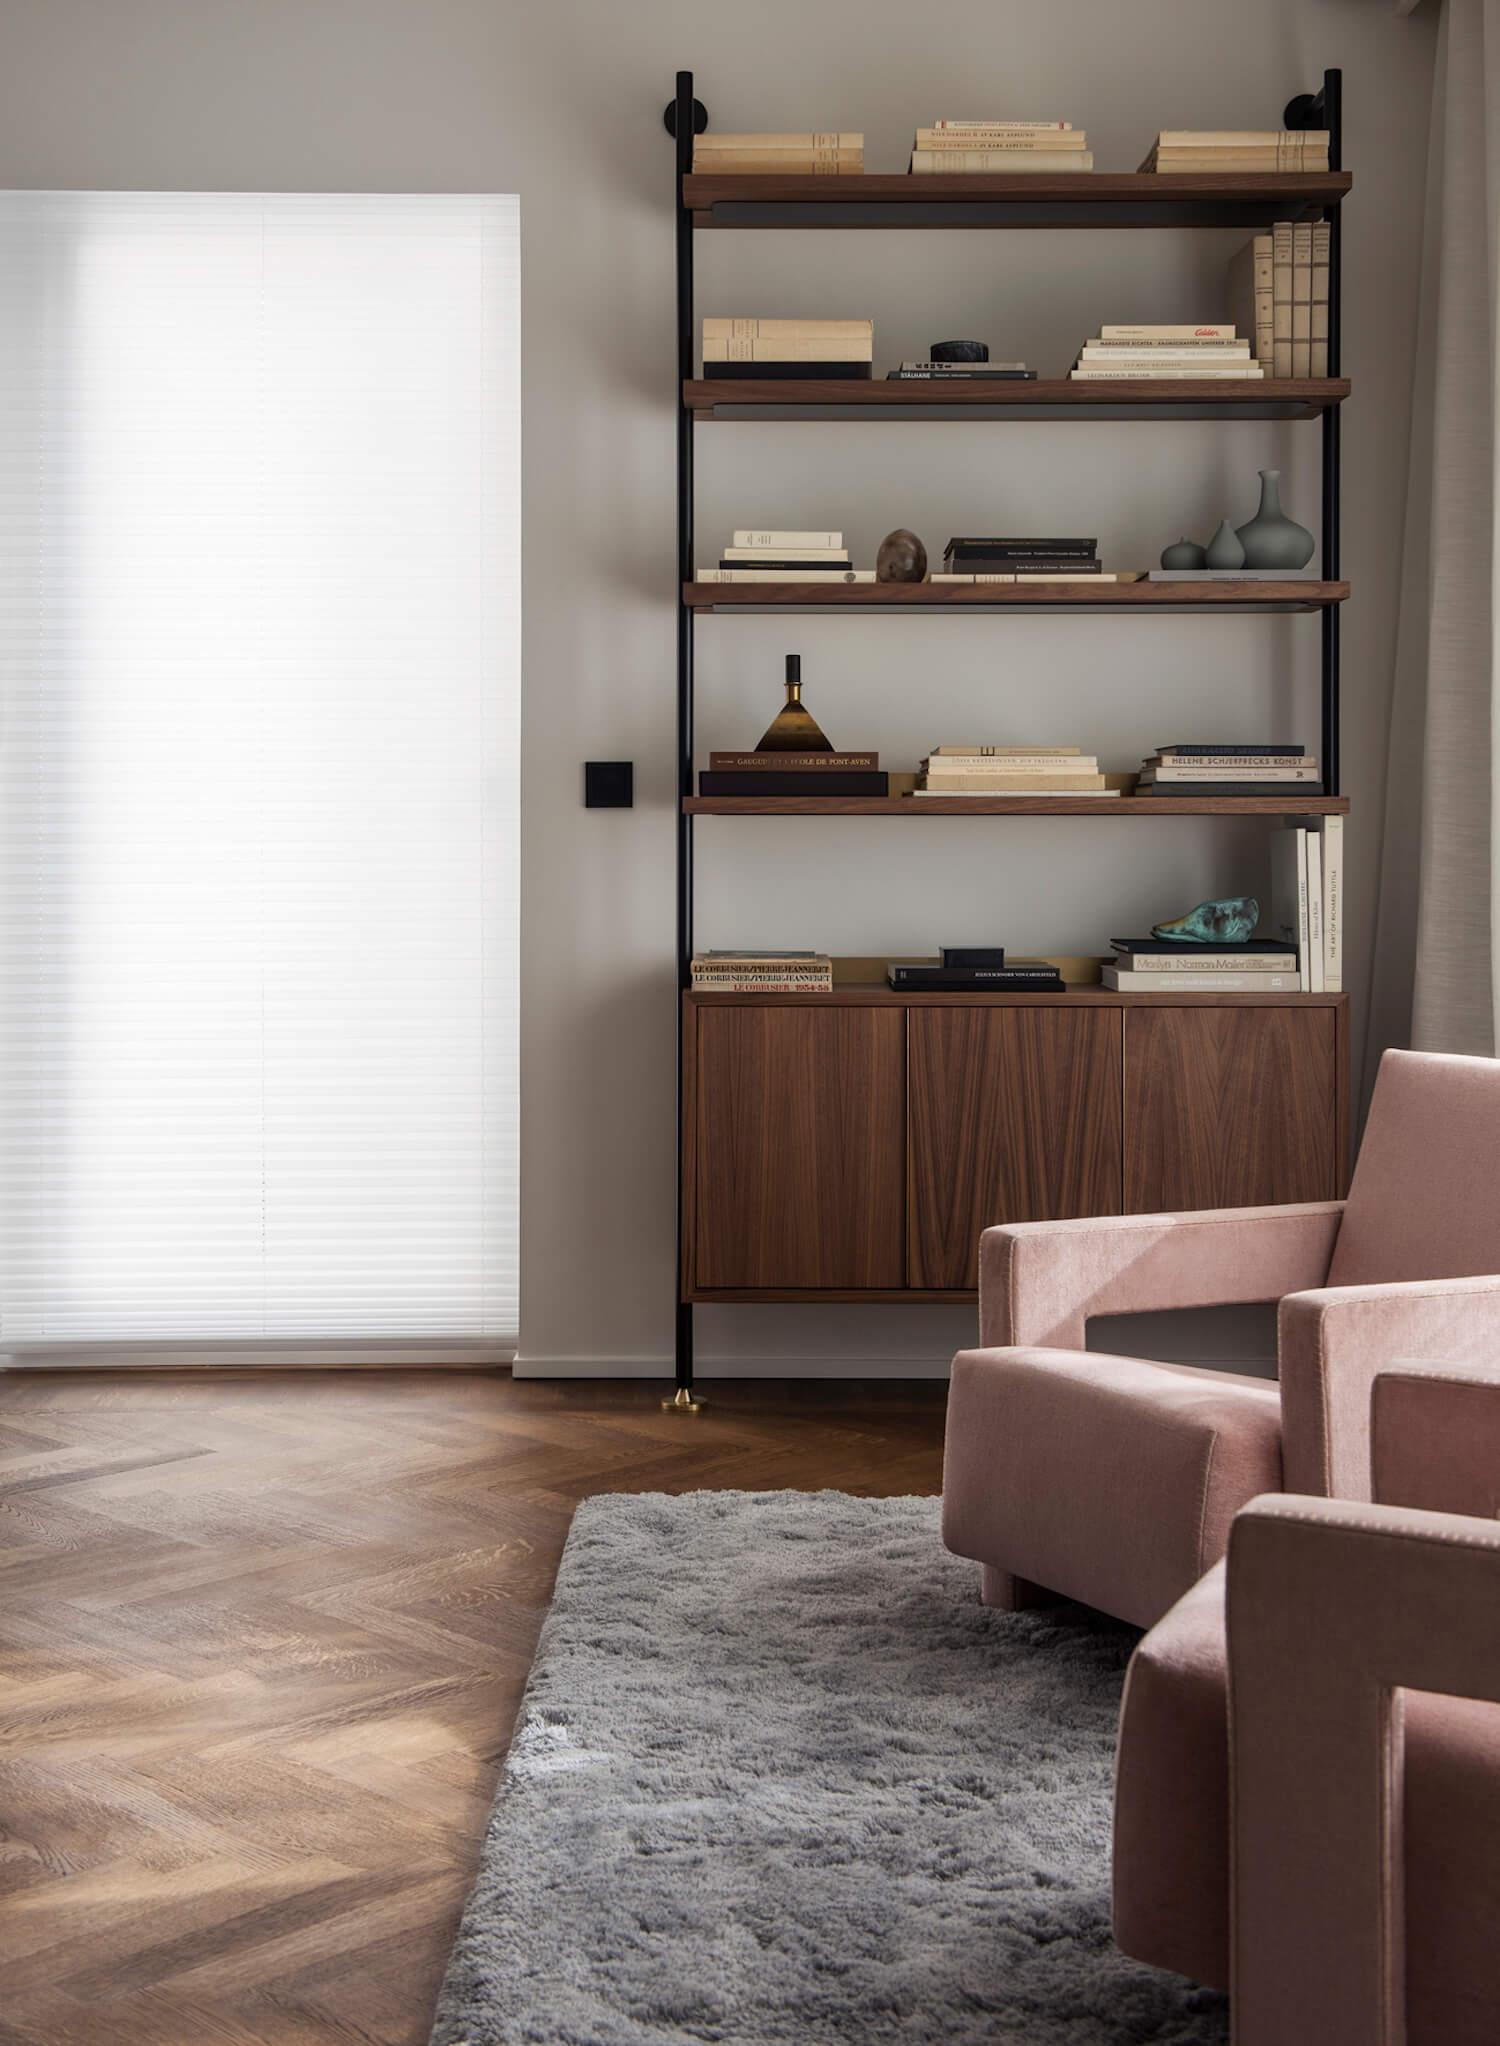 est living interiors lidingo home liljencrantz design 3